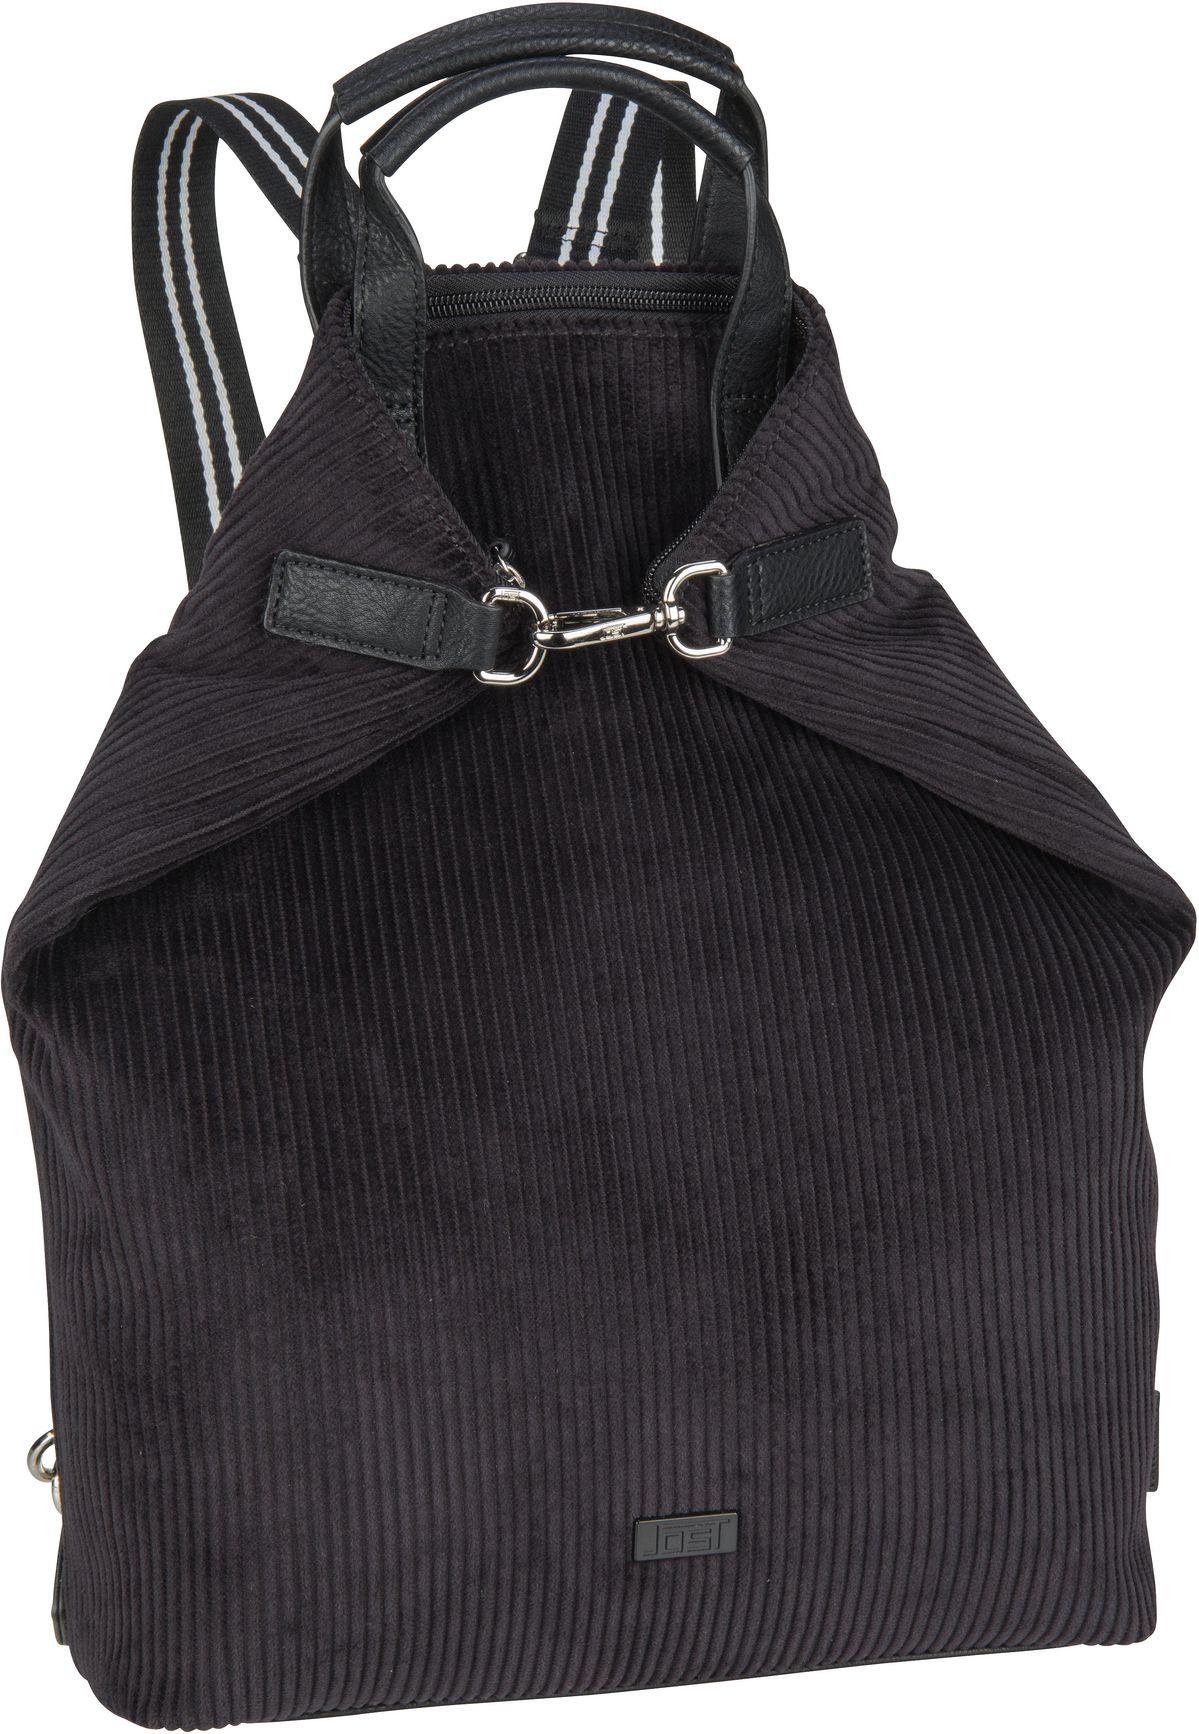 Rucksack / Daypack Cord 7945 X-Change Bag S Black